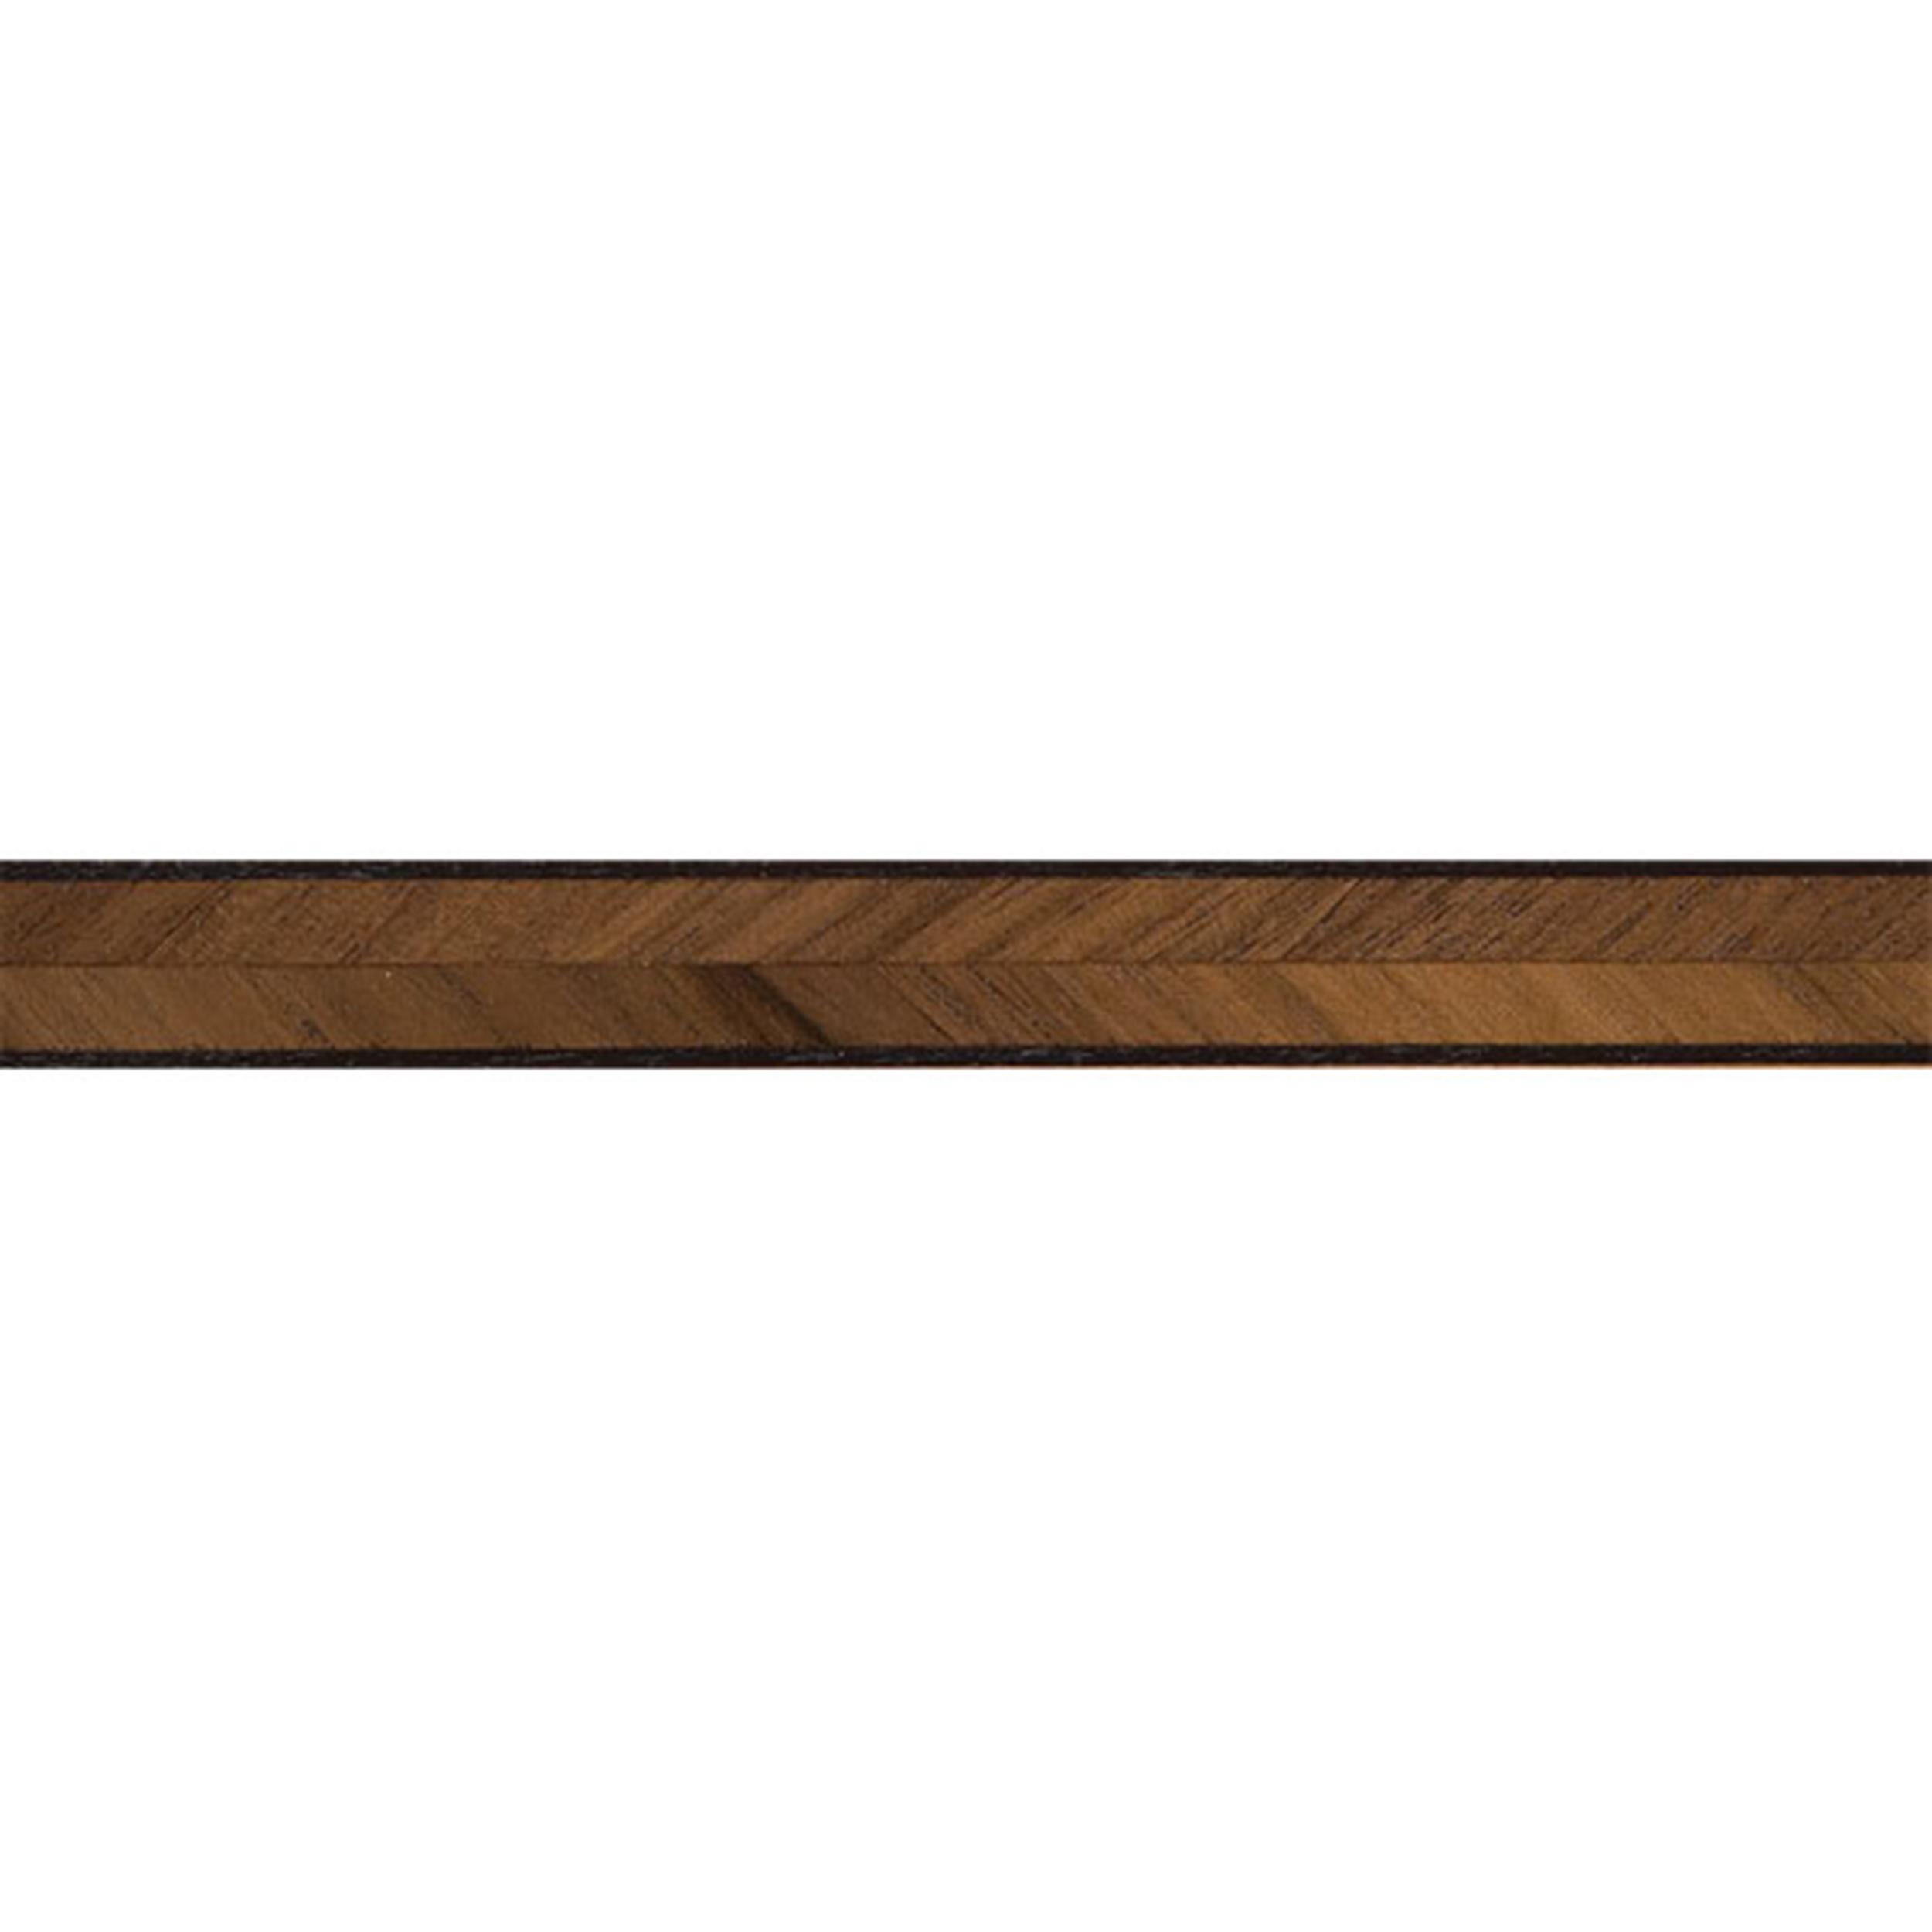 Wood Inlay Strip #27 1/2